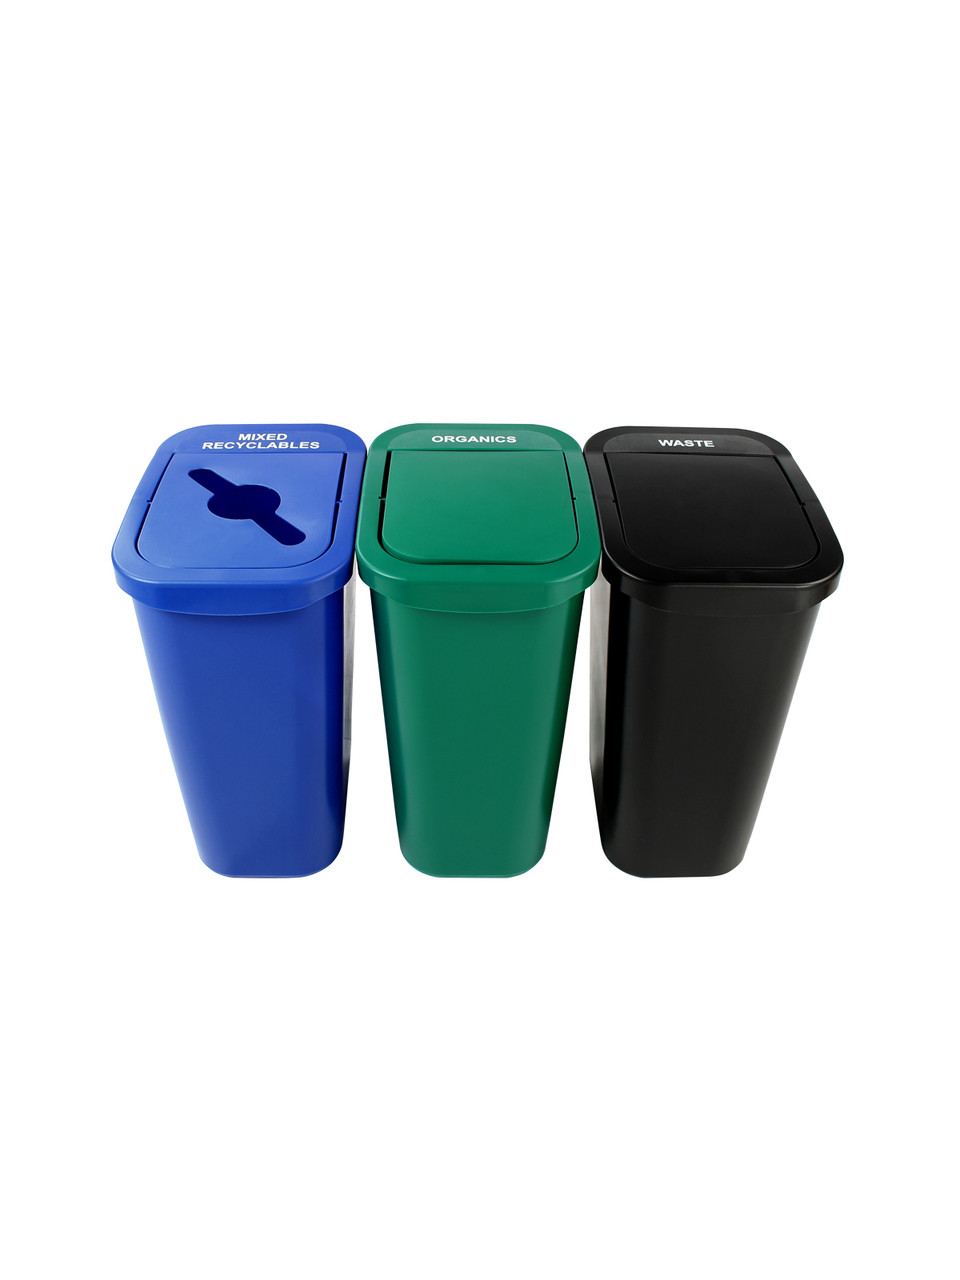 30 Gallon Billi Box Triple Trash Can Recycle Bin Center 8102028-244 (Mixed, Organics Swing, Waste Swing)